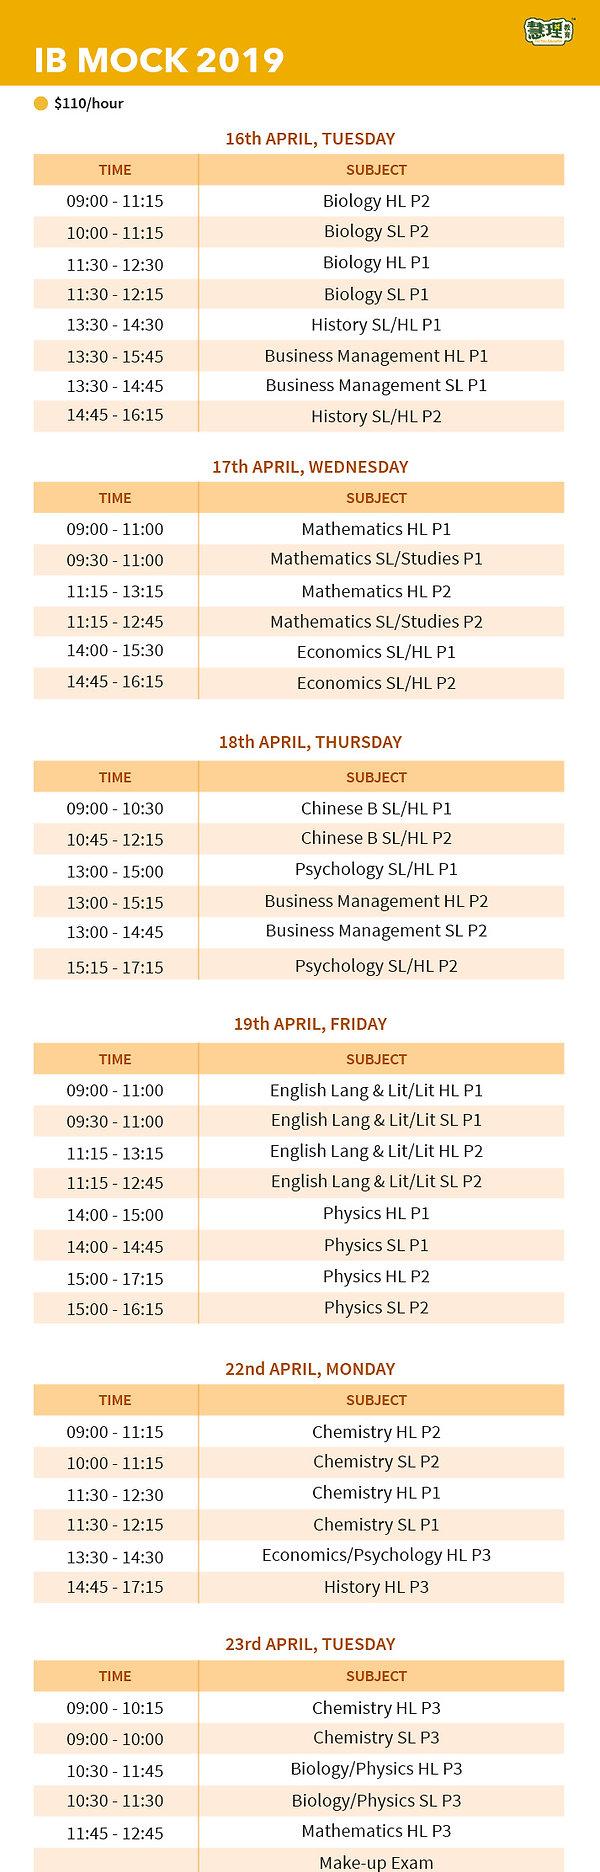 IB_Mock_timetable.jpg